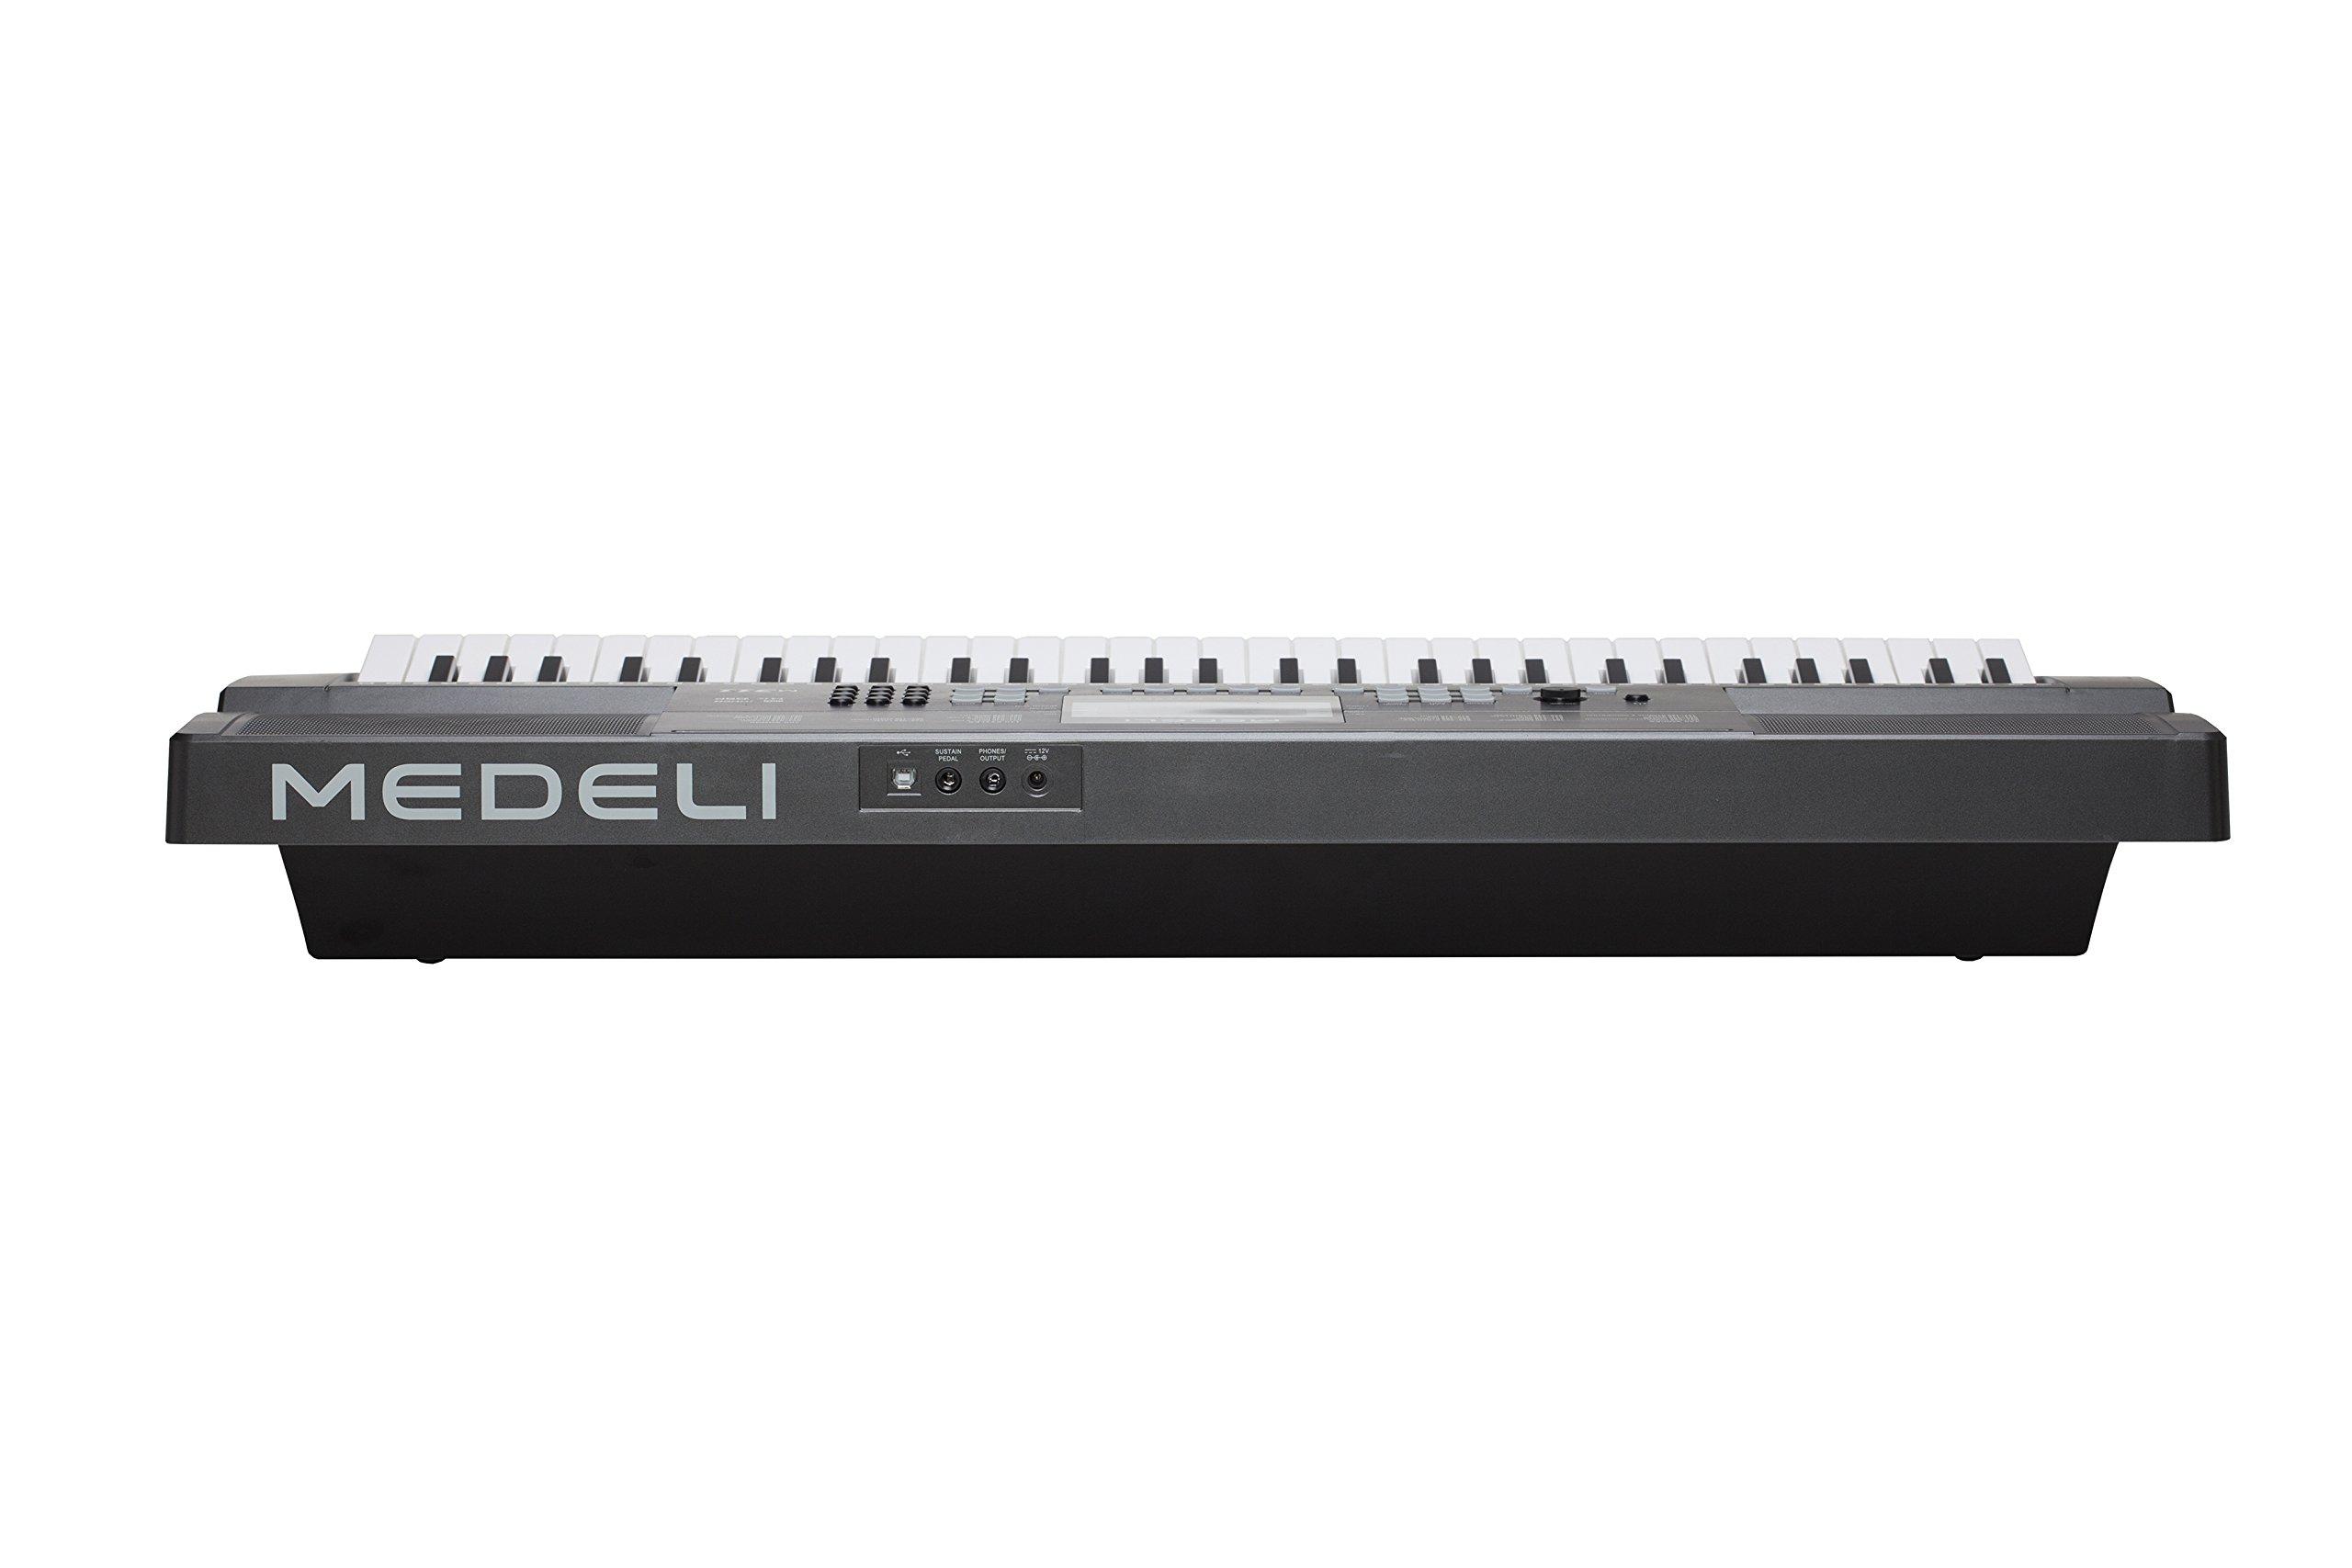 Medeli M311 Electronic Keyboard by Medeli (Image #4)